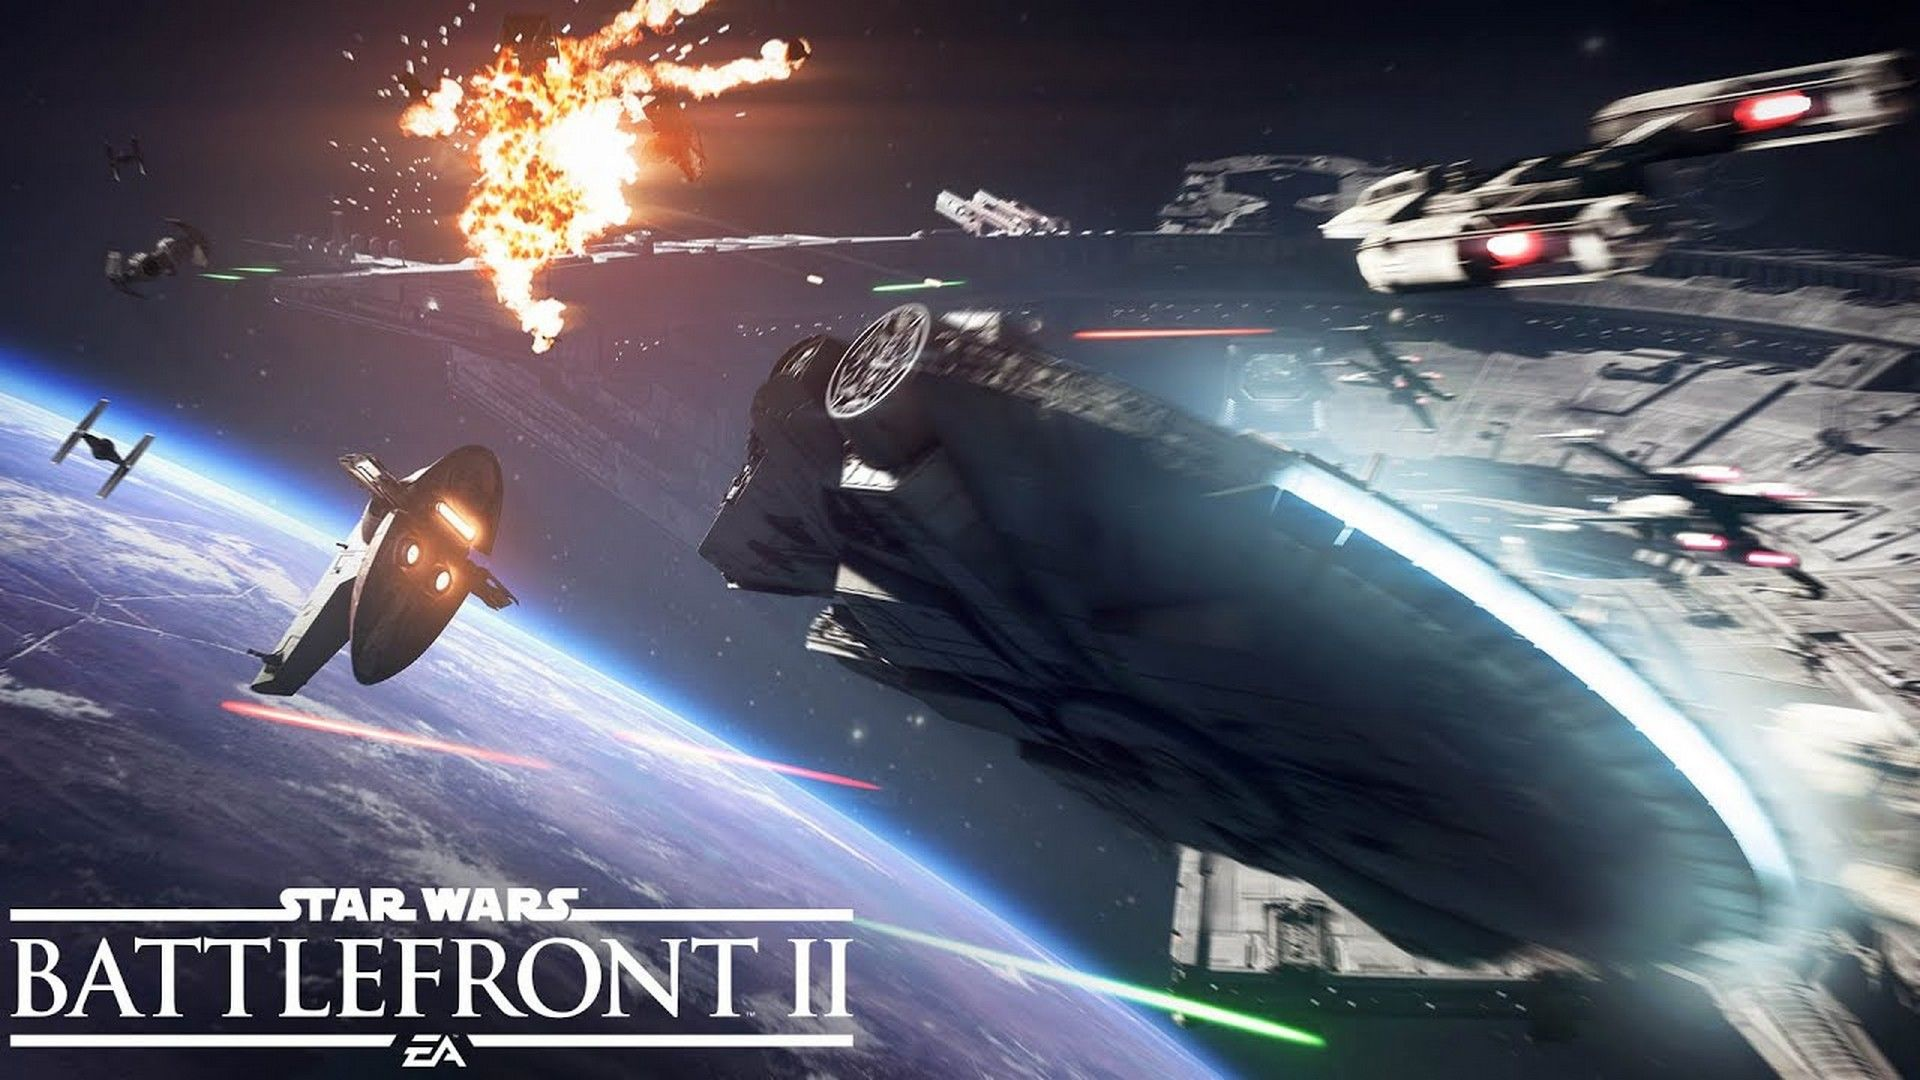 950x1534 Game Star Wars Battlefront Ii 2017 Game Wallpaper In